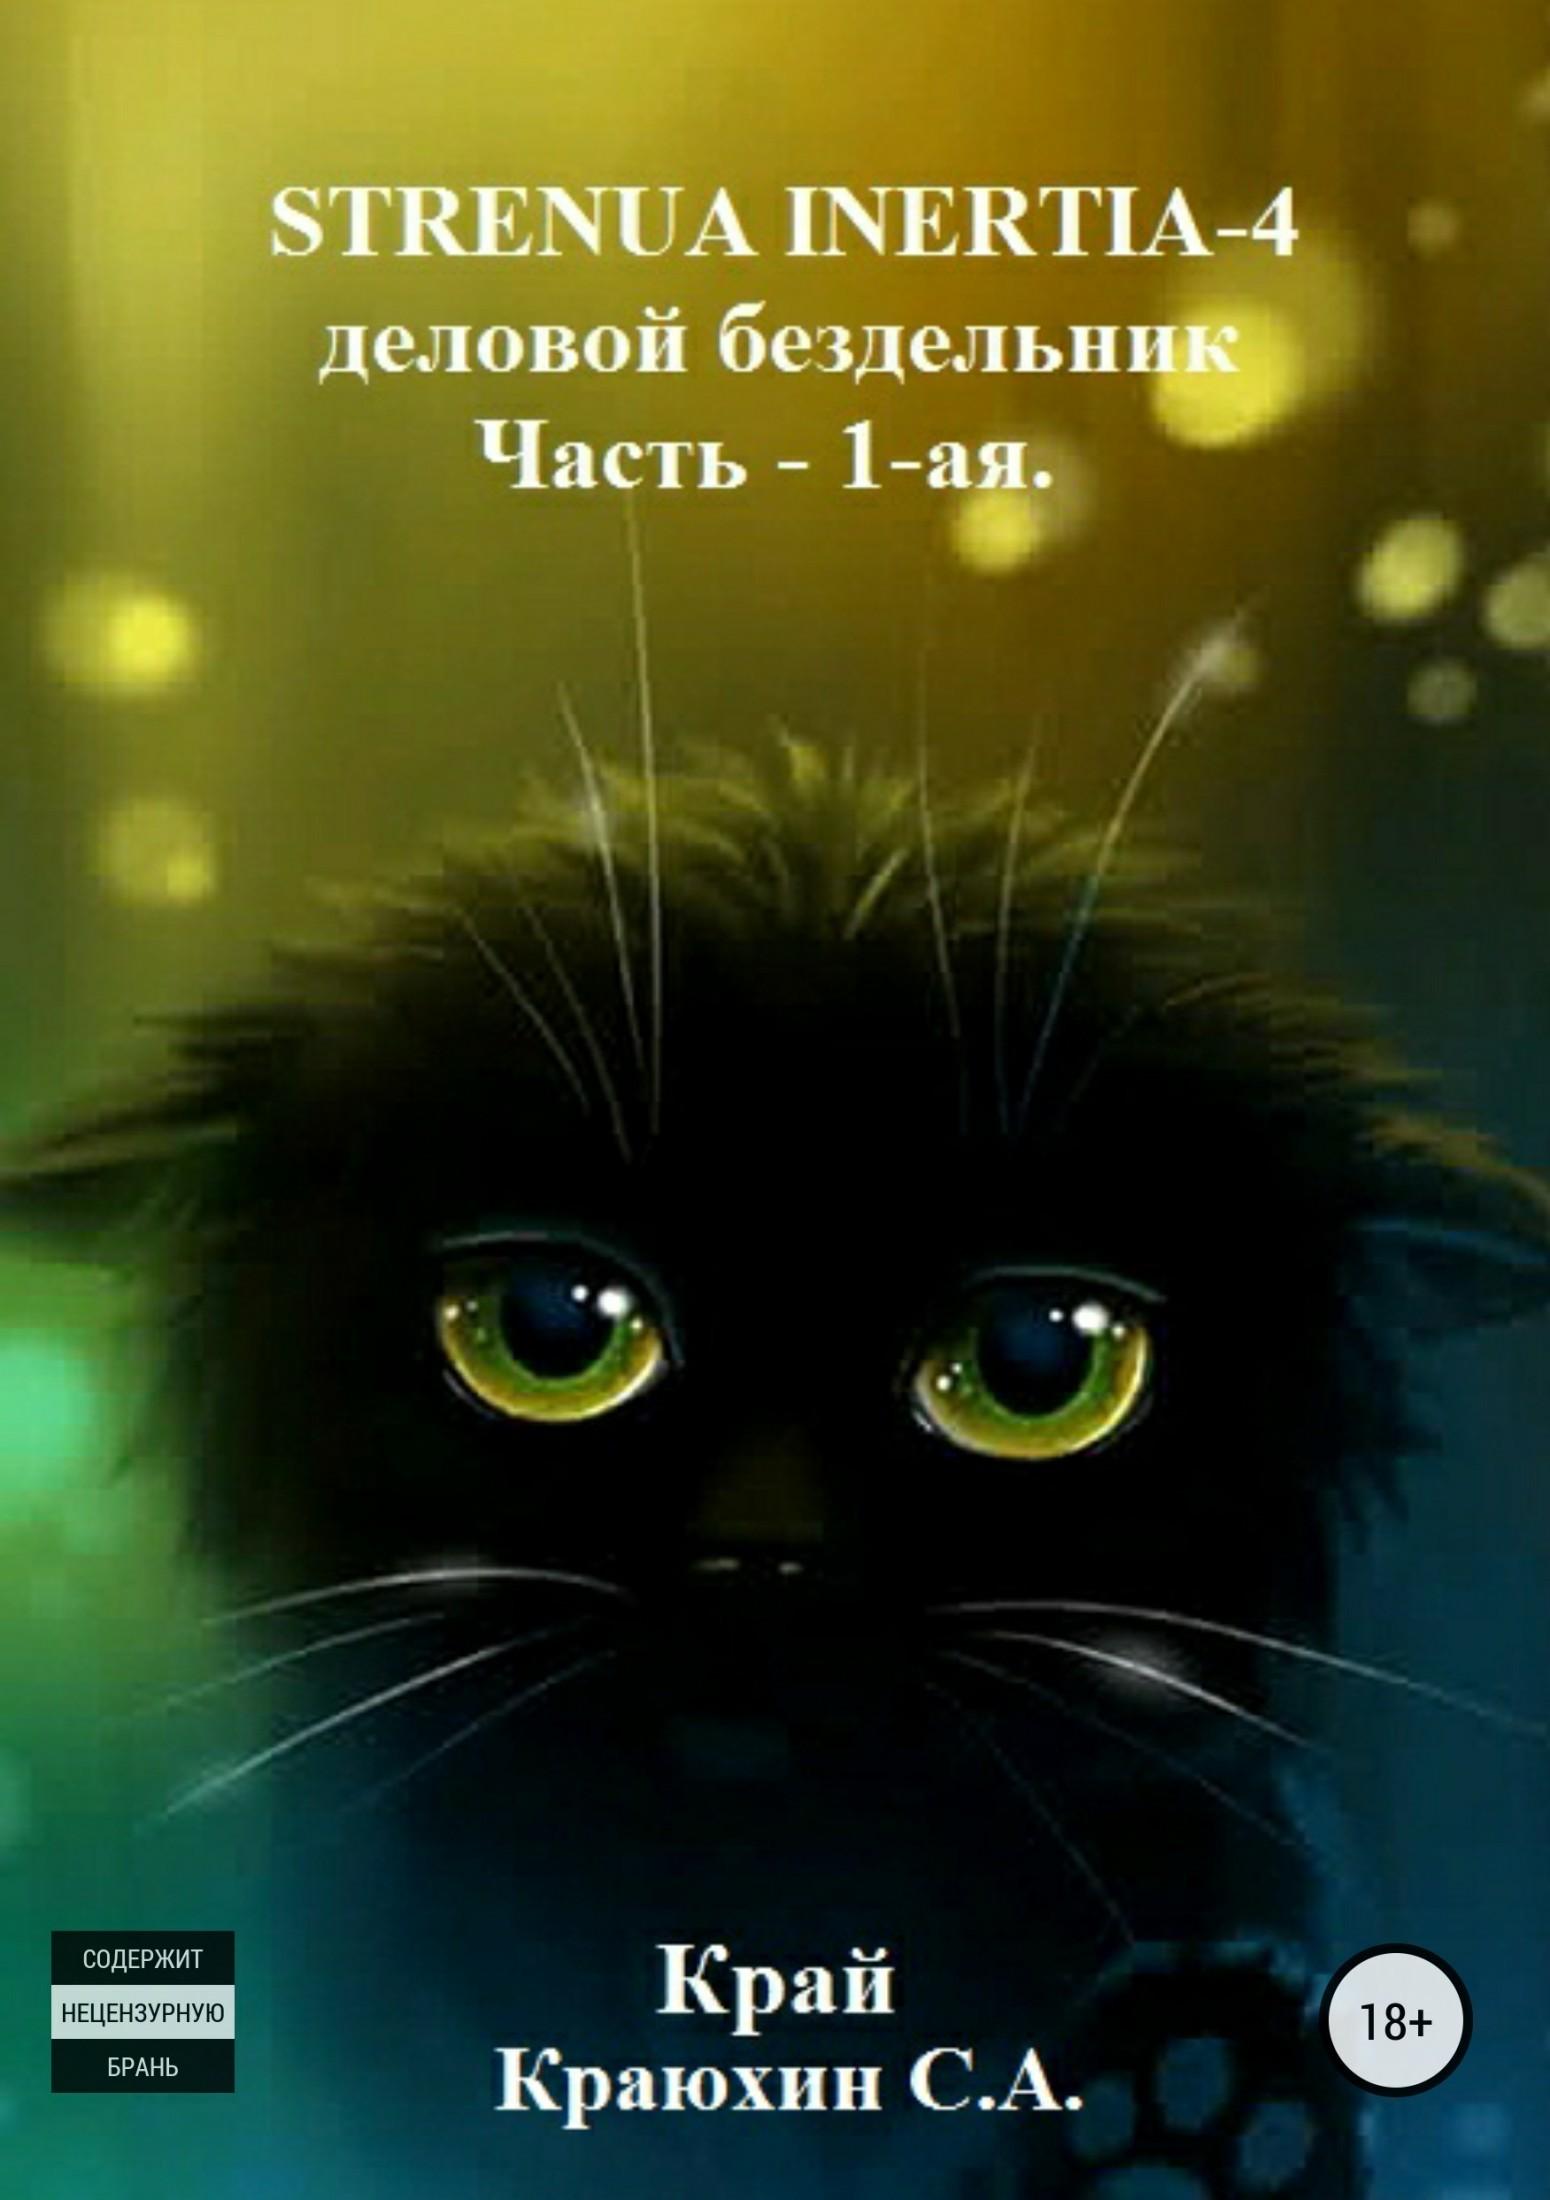 Сергей Александрович Краюхин Strenua inertia 4! Часть 1. Деловой бездельник сергей александрович краюхин крайняя поэзия